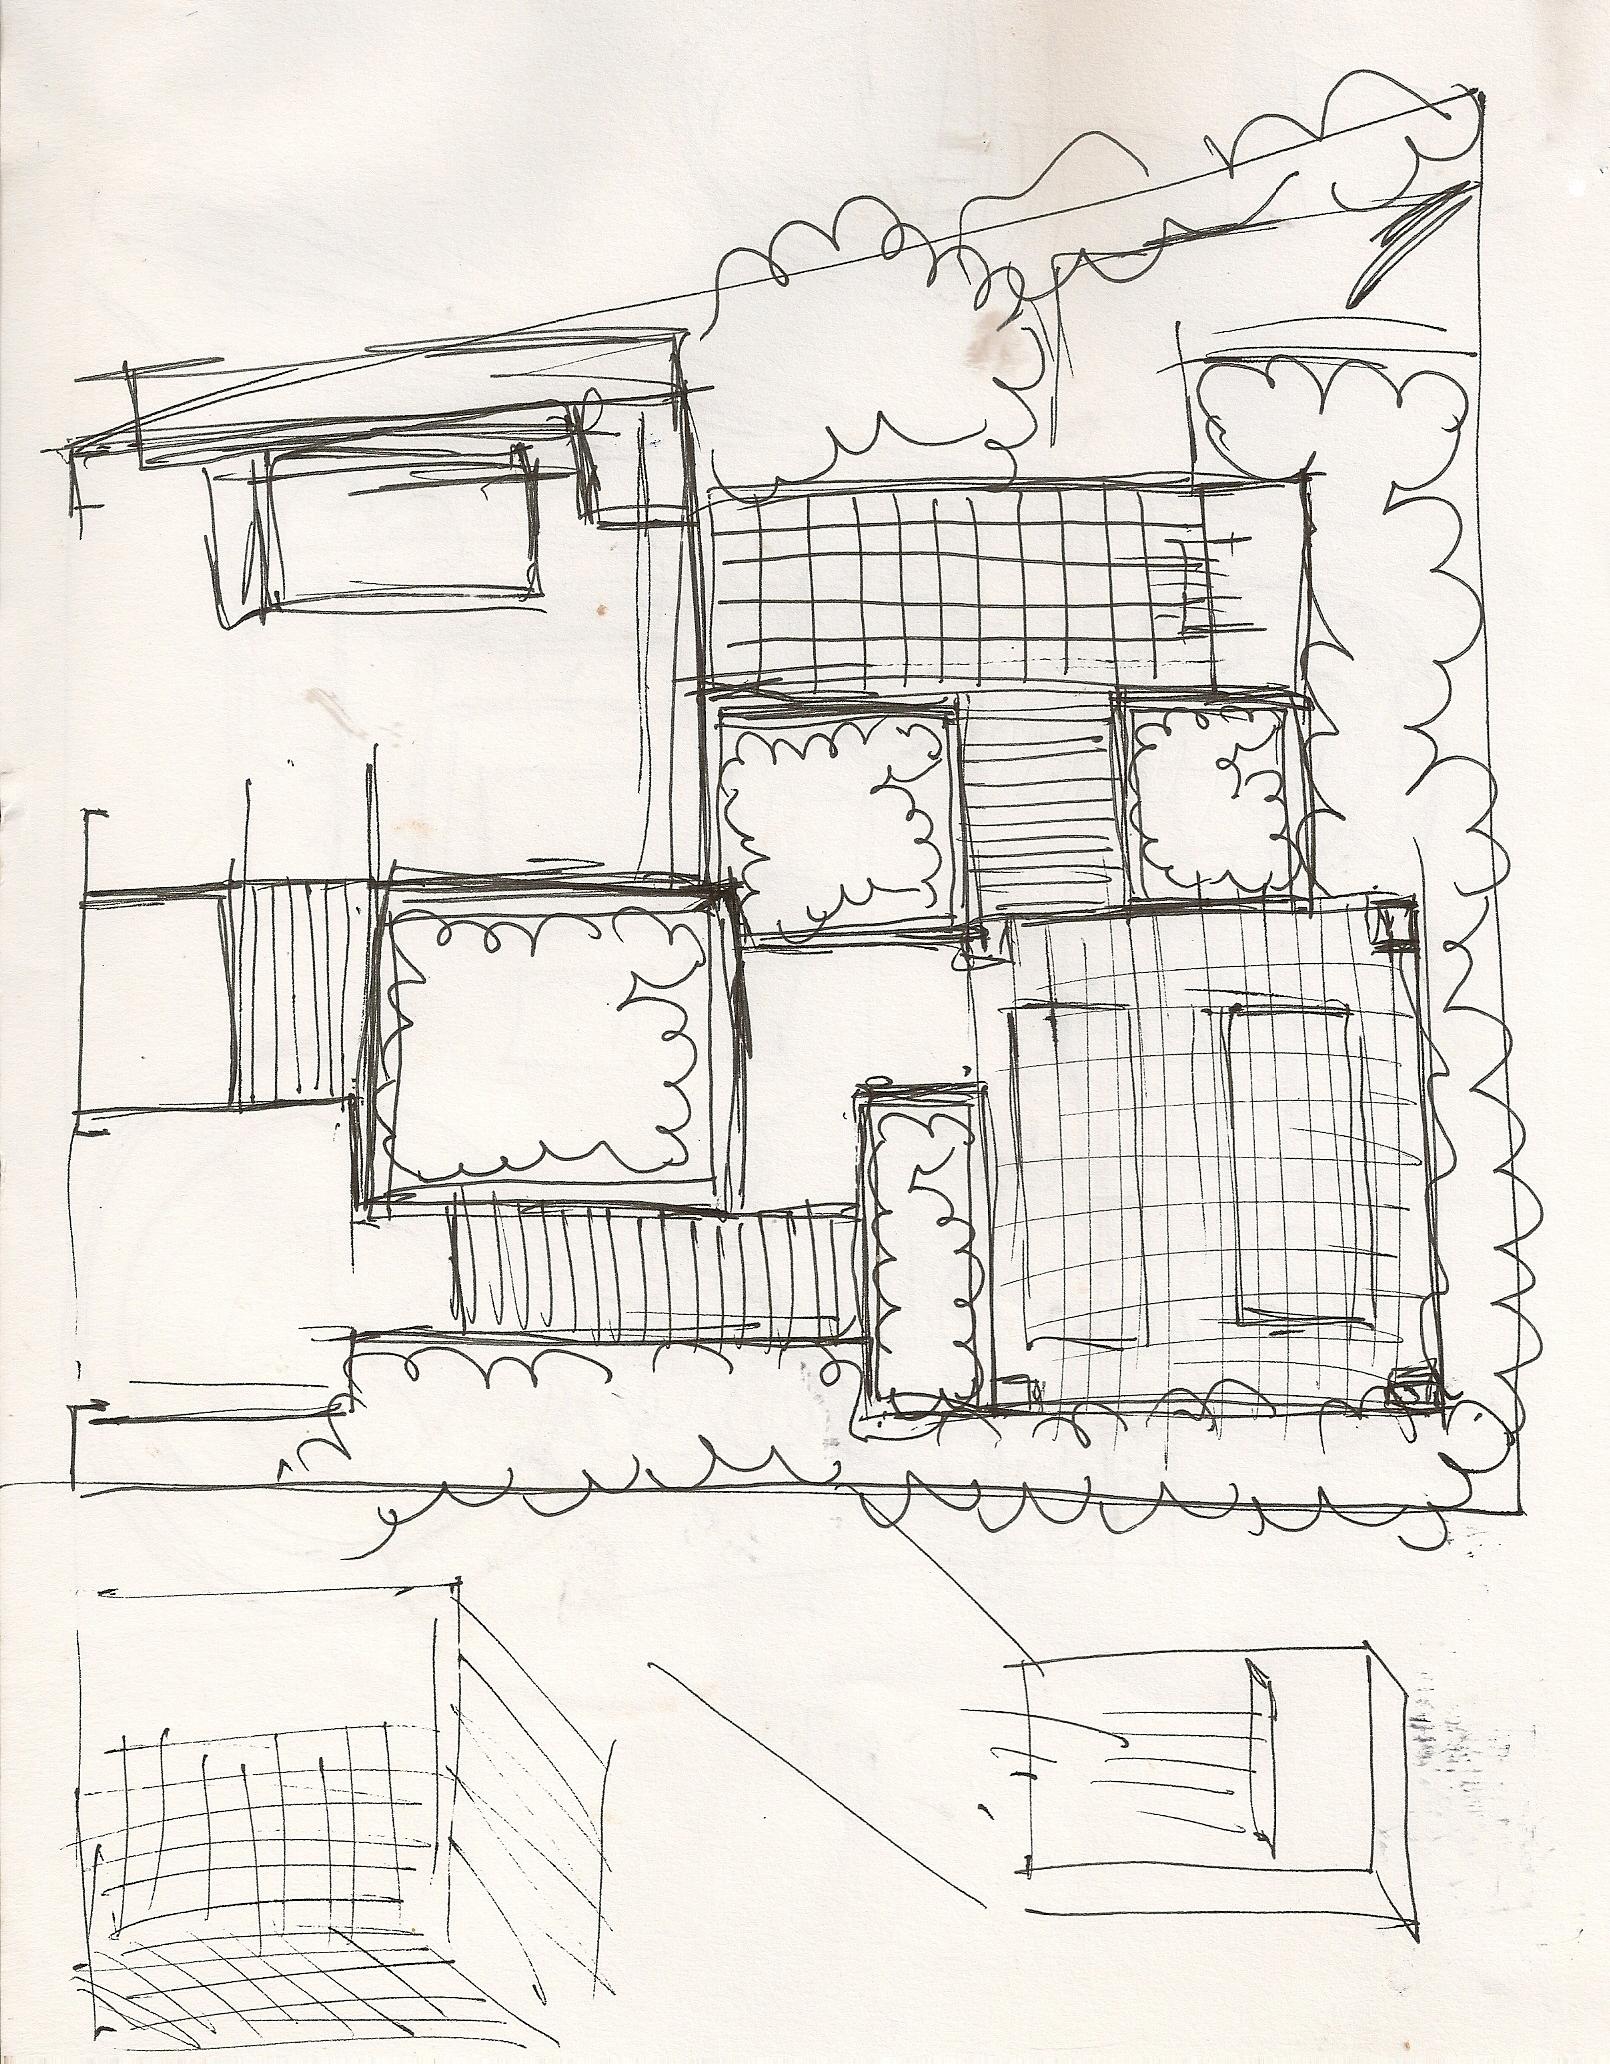 London Garden Design Sketch, Winchmore Hill